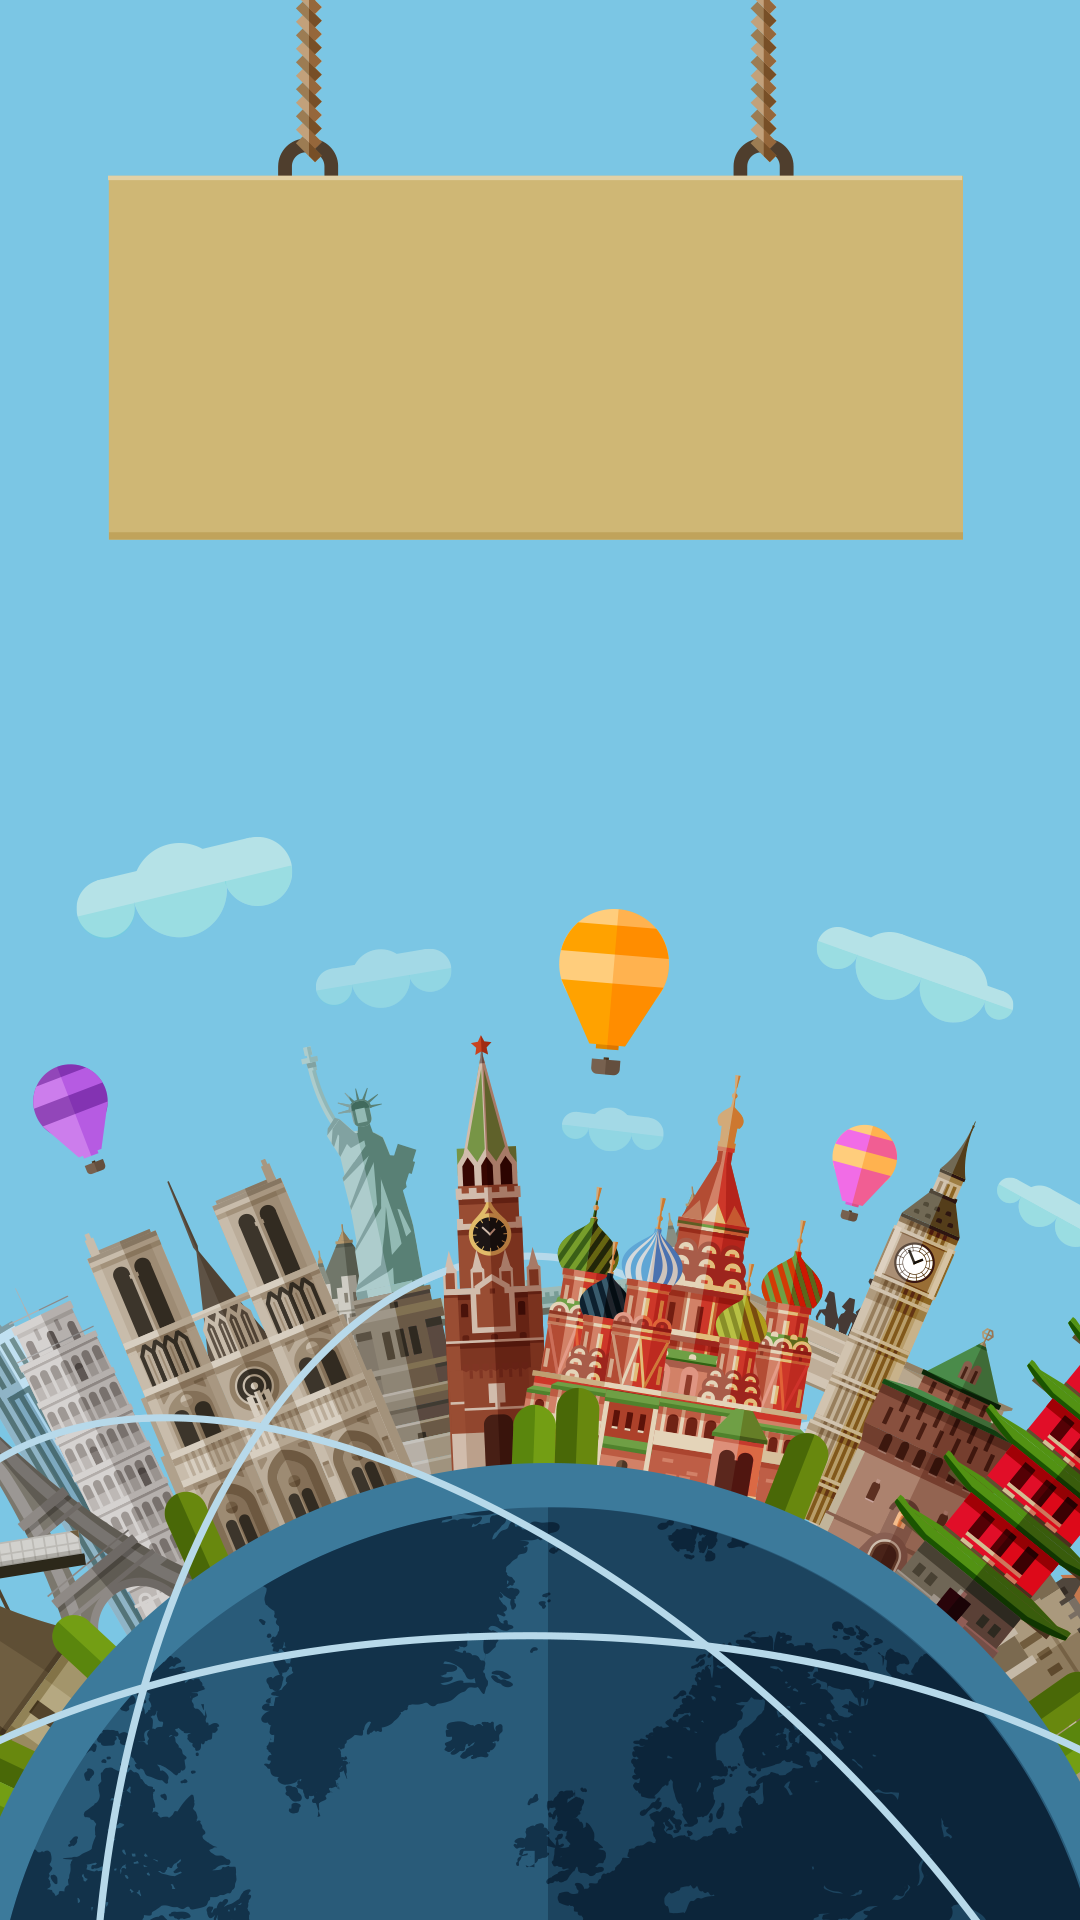 Tap And Get The Free App Lockscreens Art Creative Travel Vacation Multicolor Sky Clouds Hd Iphone 6 Plus L Smartphone Hintergrund Hintergrund Computerspiele